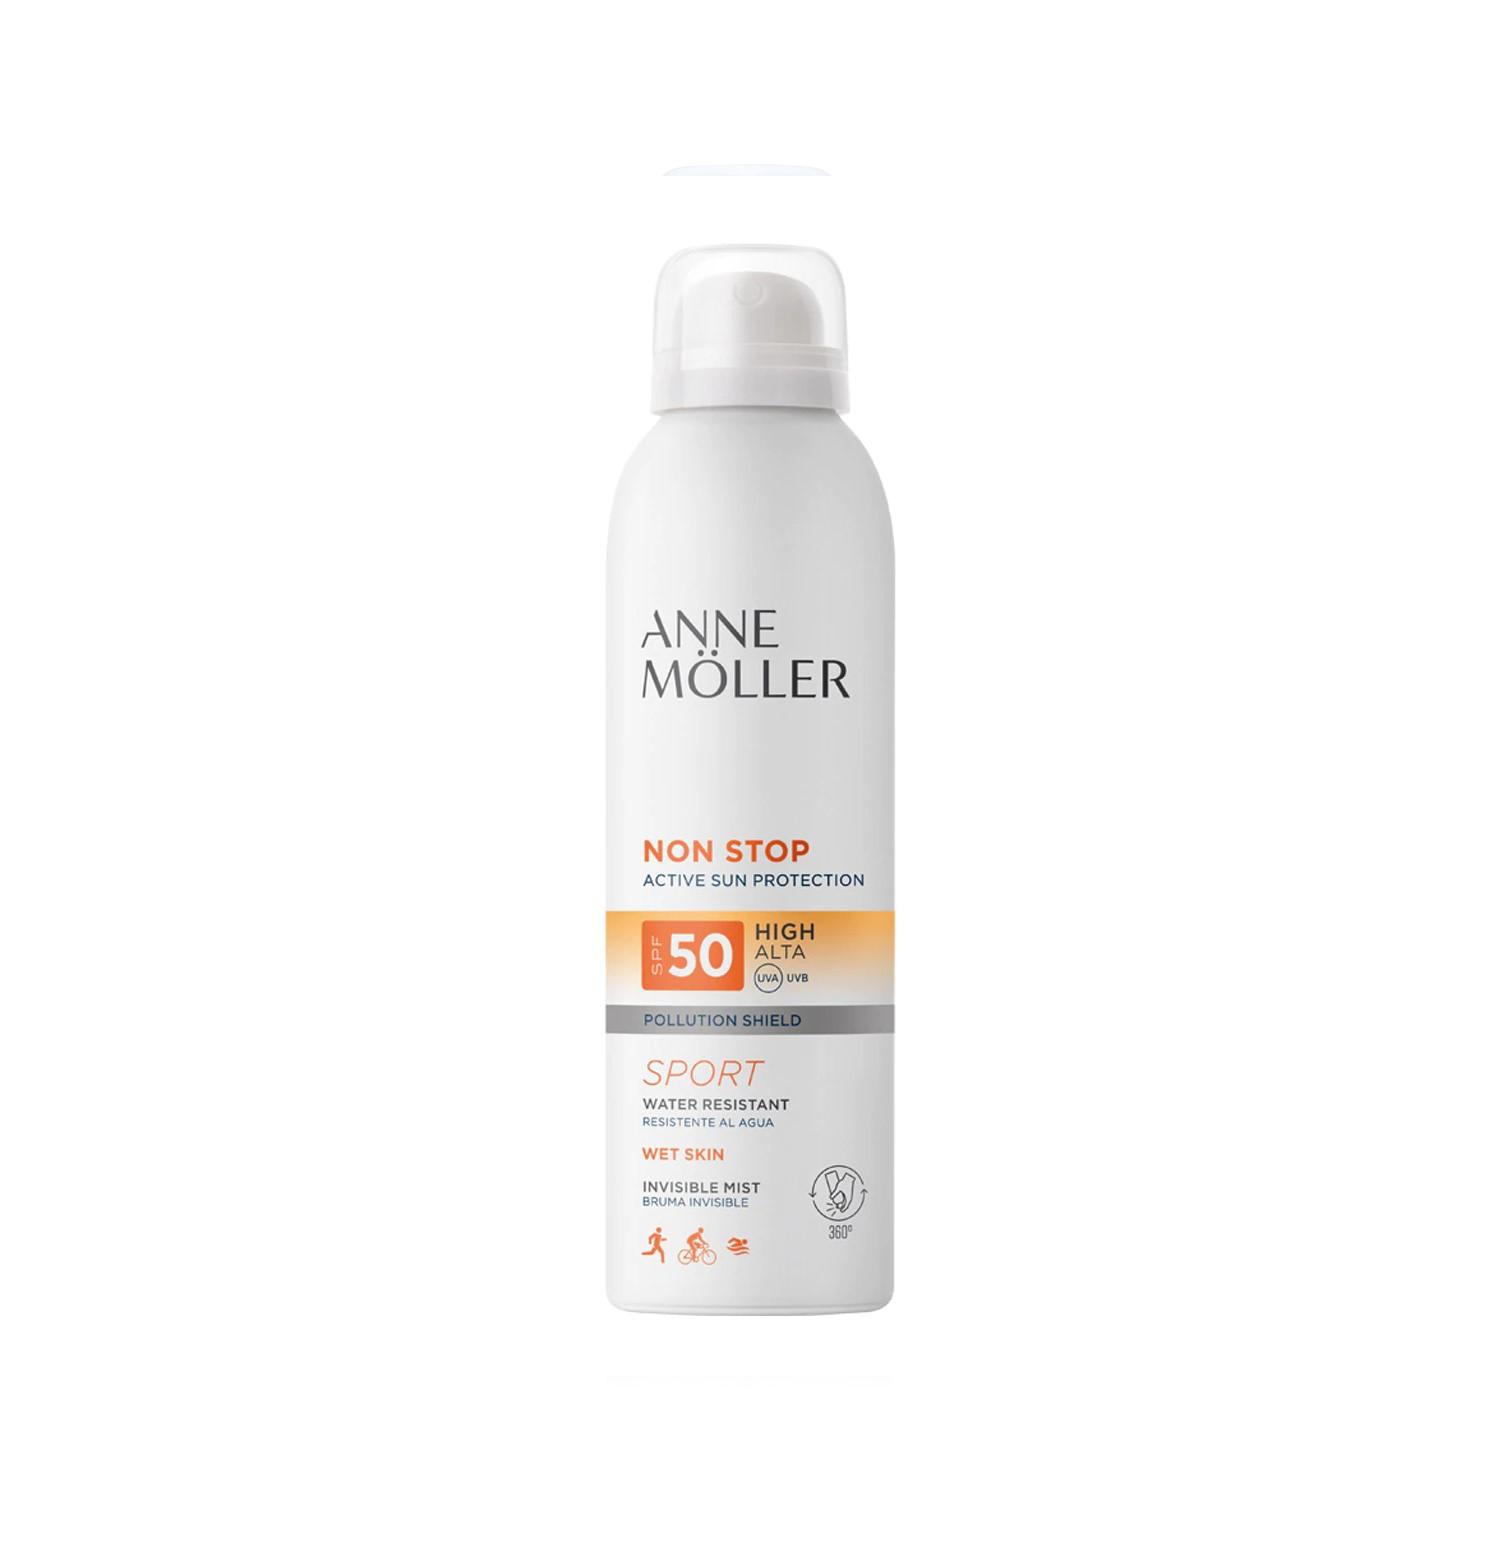 Non Stop Mist Invisible SPF50 200 ml Anne Möller